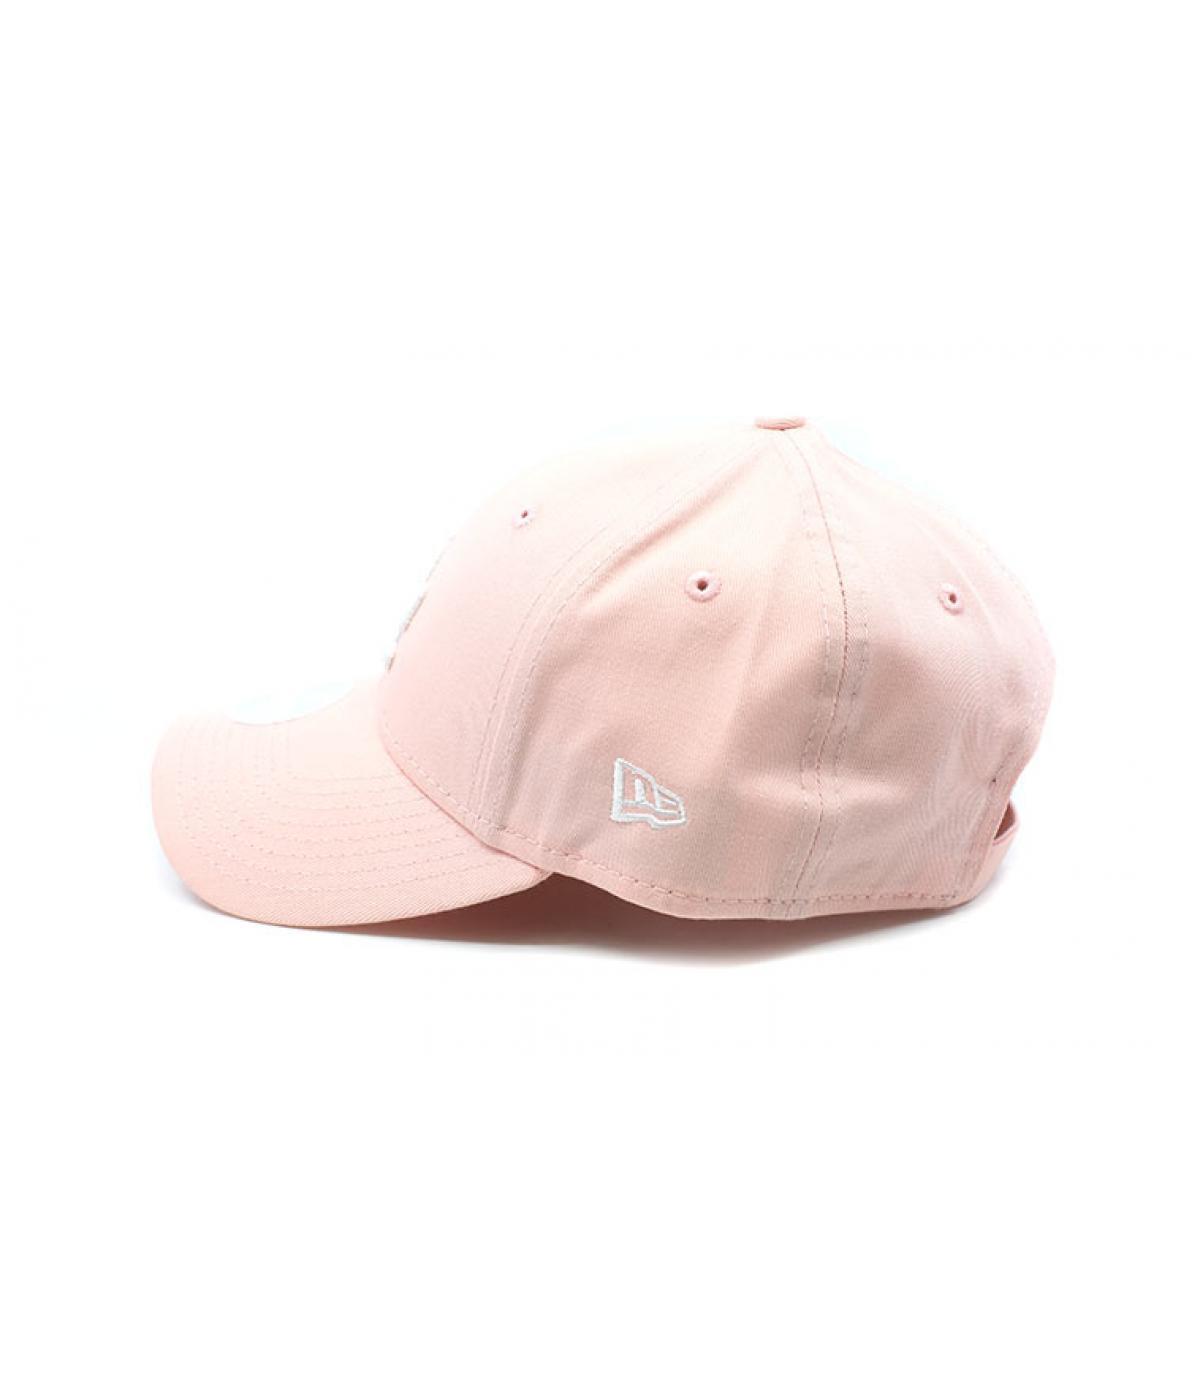 Details Cap Wmns League Ess LA 9Forty pink - Abbildung 4